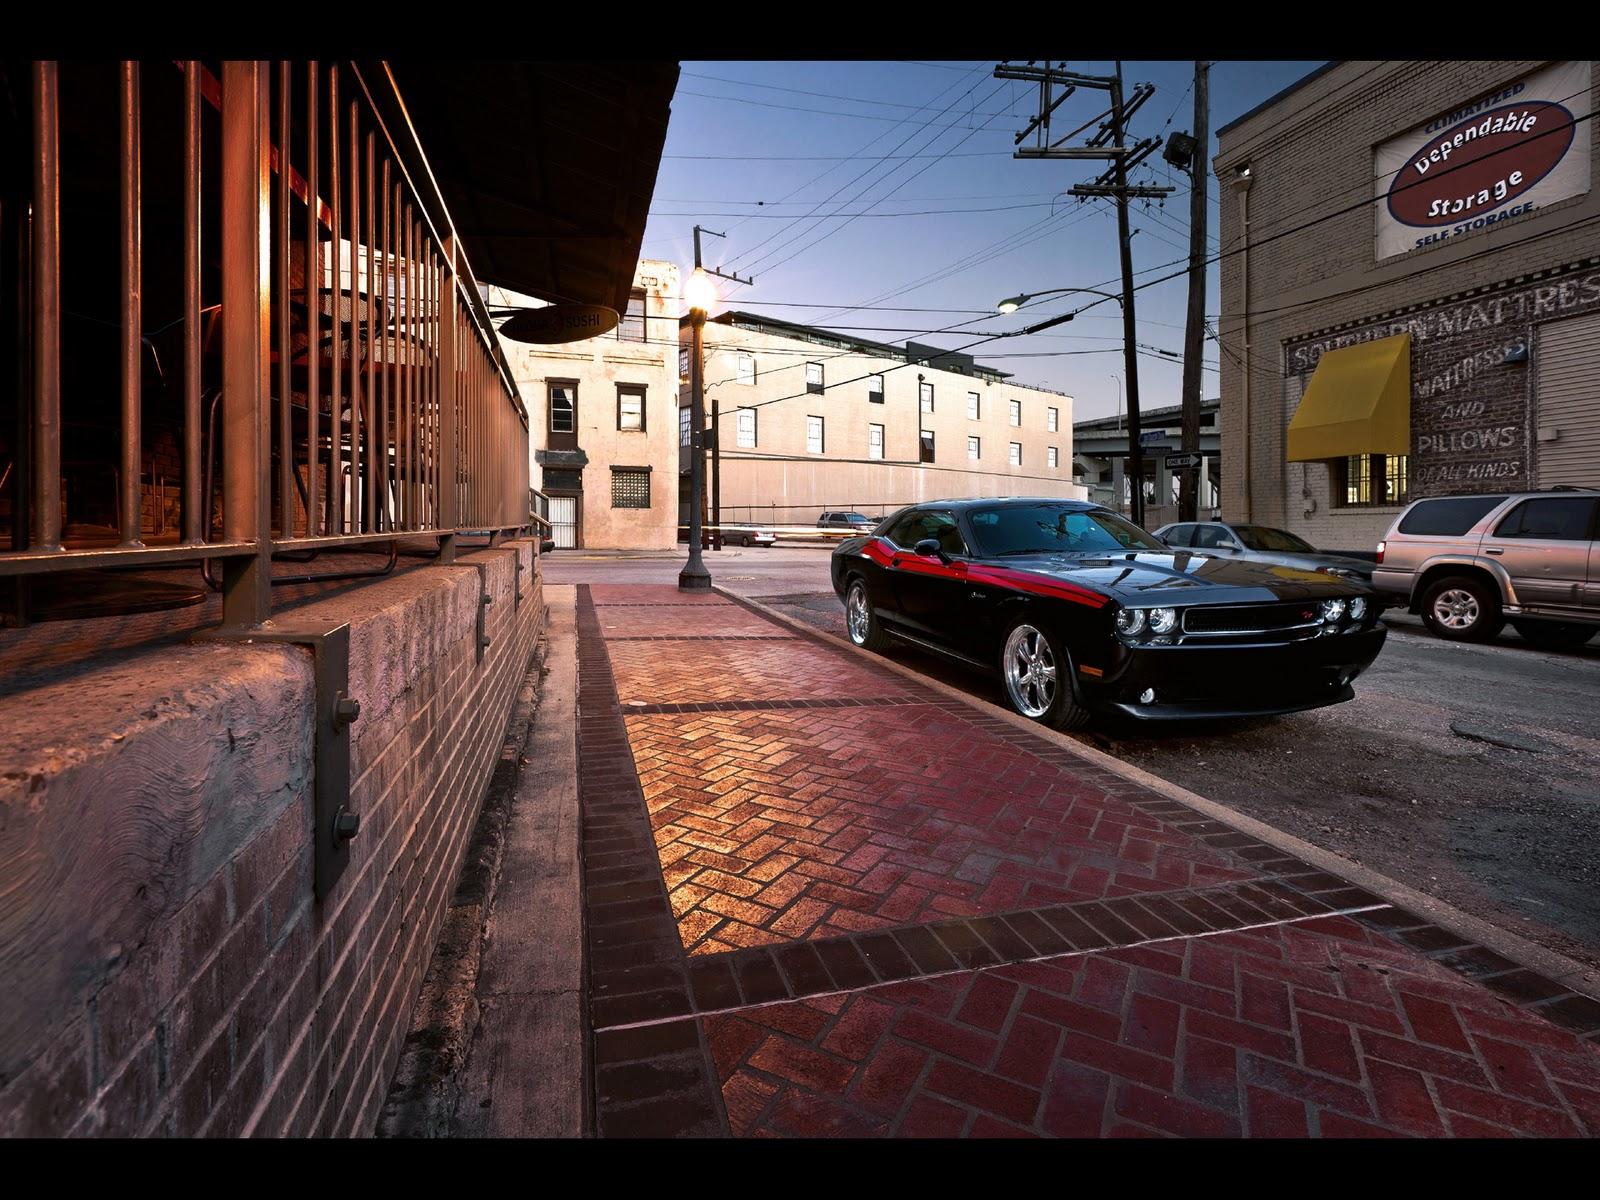 http://3.bp.blogspot.com/_viCh1SFyGrA/TUi3f95MLnI/AAAAAAAAAUg/ZT1CIOYINPM/s1600/2011-Dodge-Challenger-RT-Front-Angle-3-1920x1440.jpg